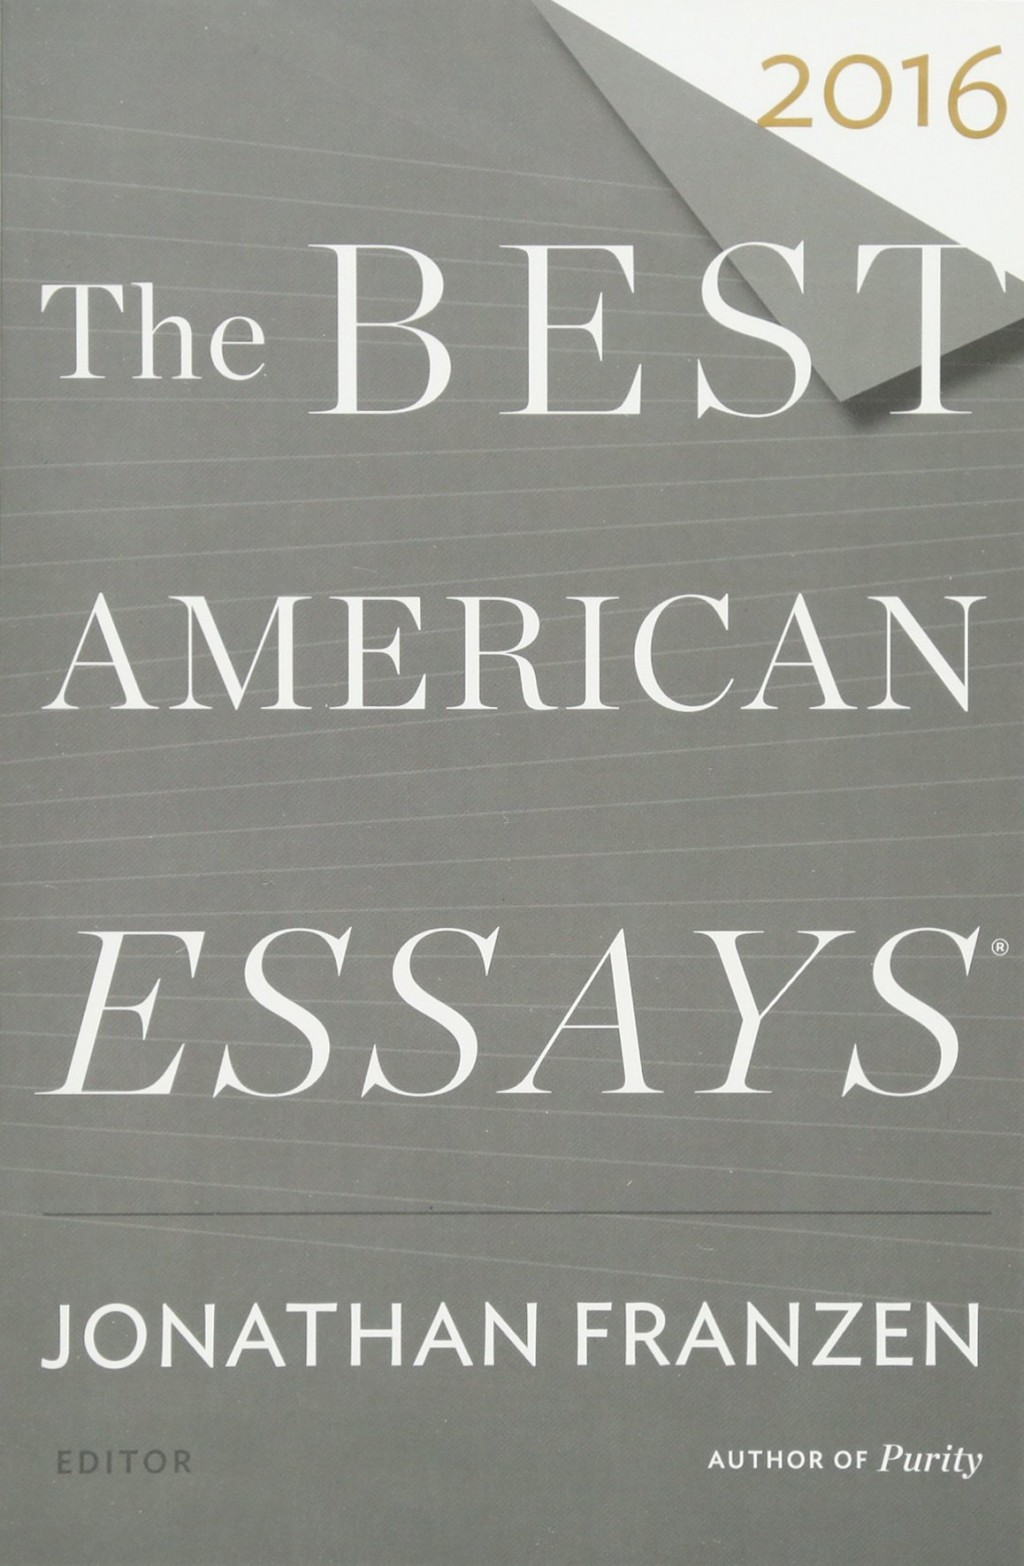 001 71a6bhsgsdl Essay Example Best Essays Breathtaking 2016 Personal College Australian Large